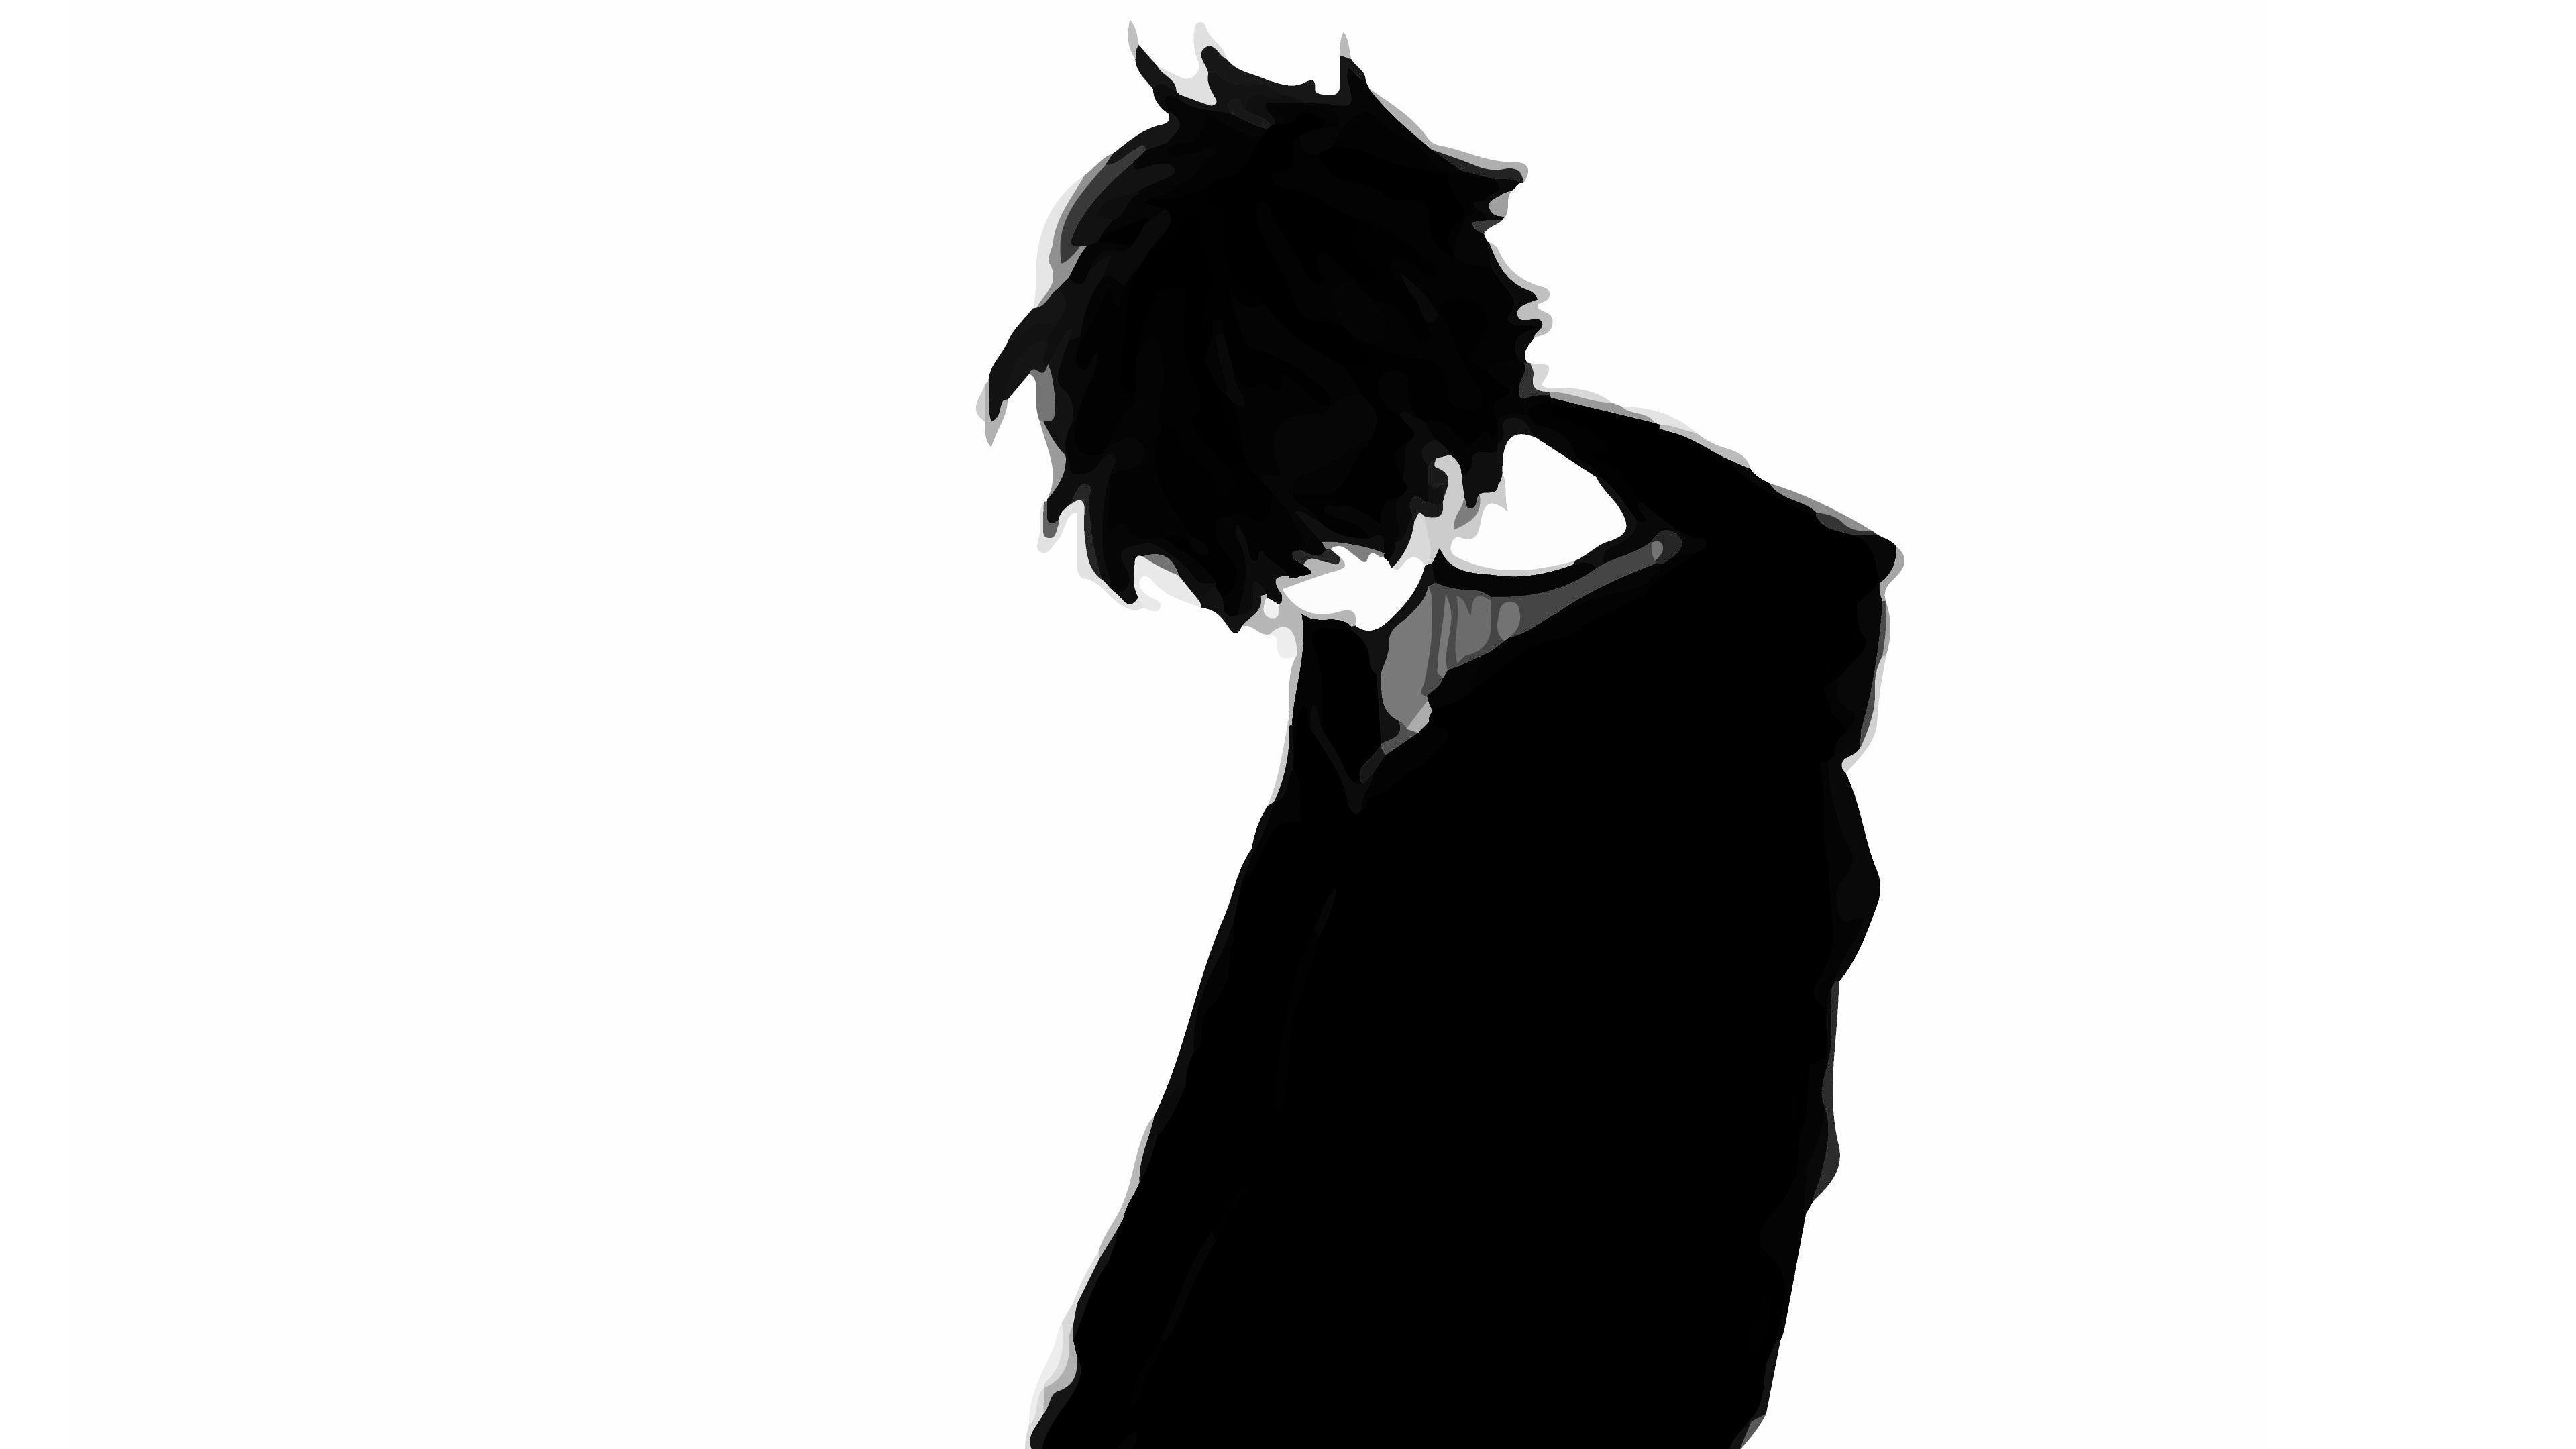 sad anime boy images